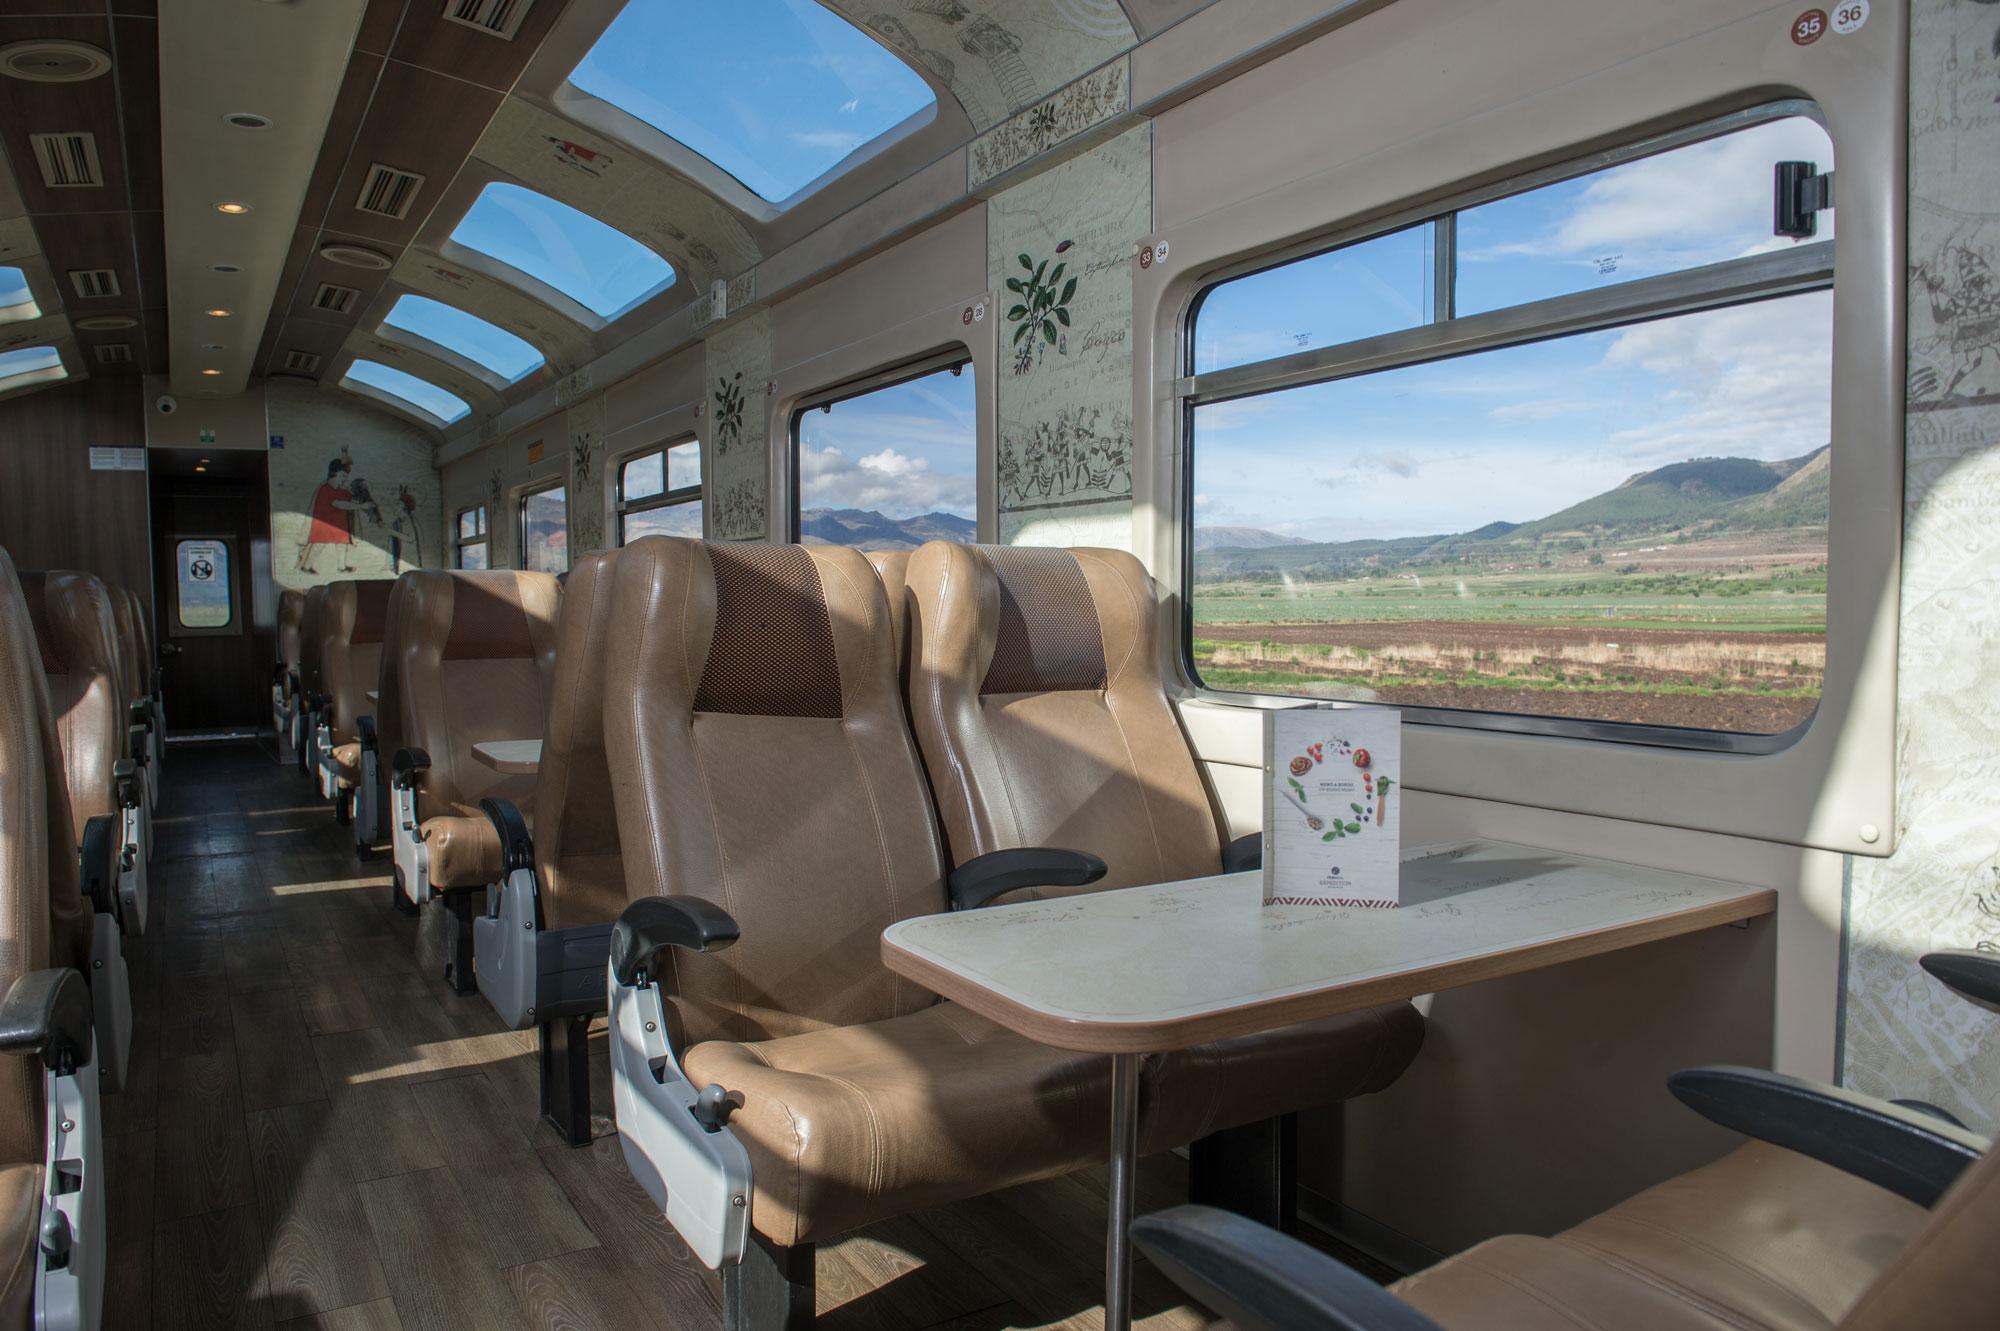 tren expedition a machu picchu